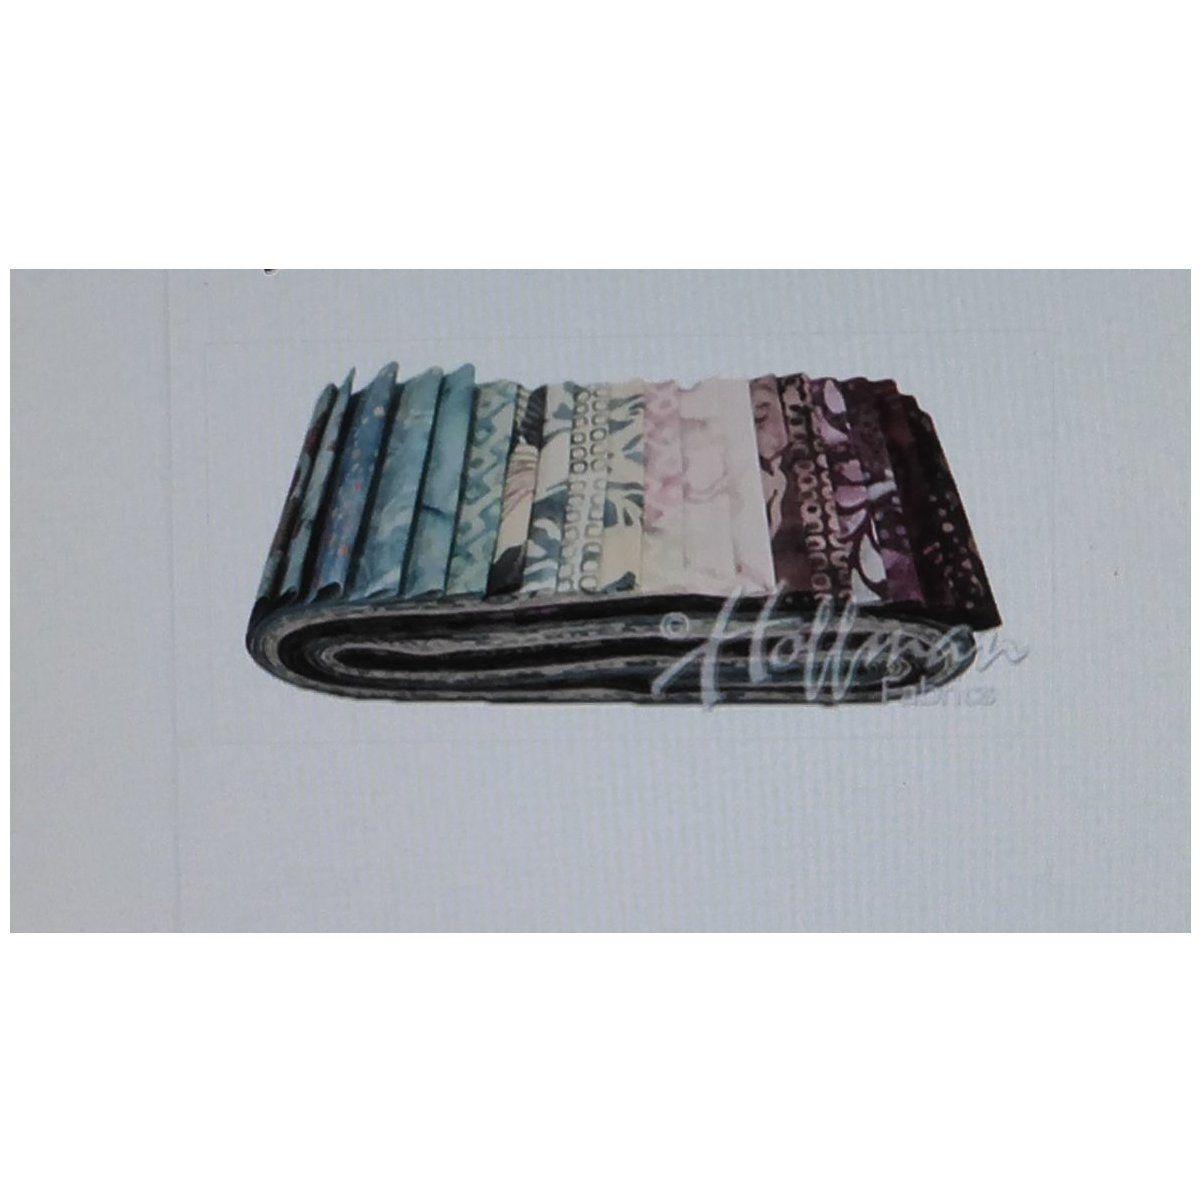 Batik bali poppyrose quartz by hoffman xinch cotton fabric